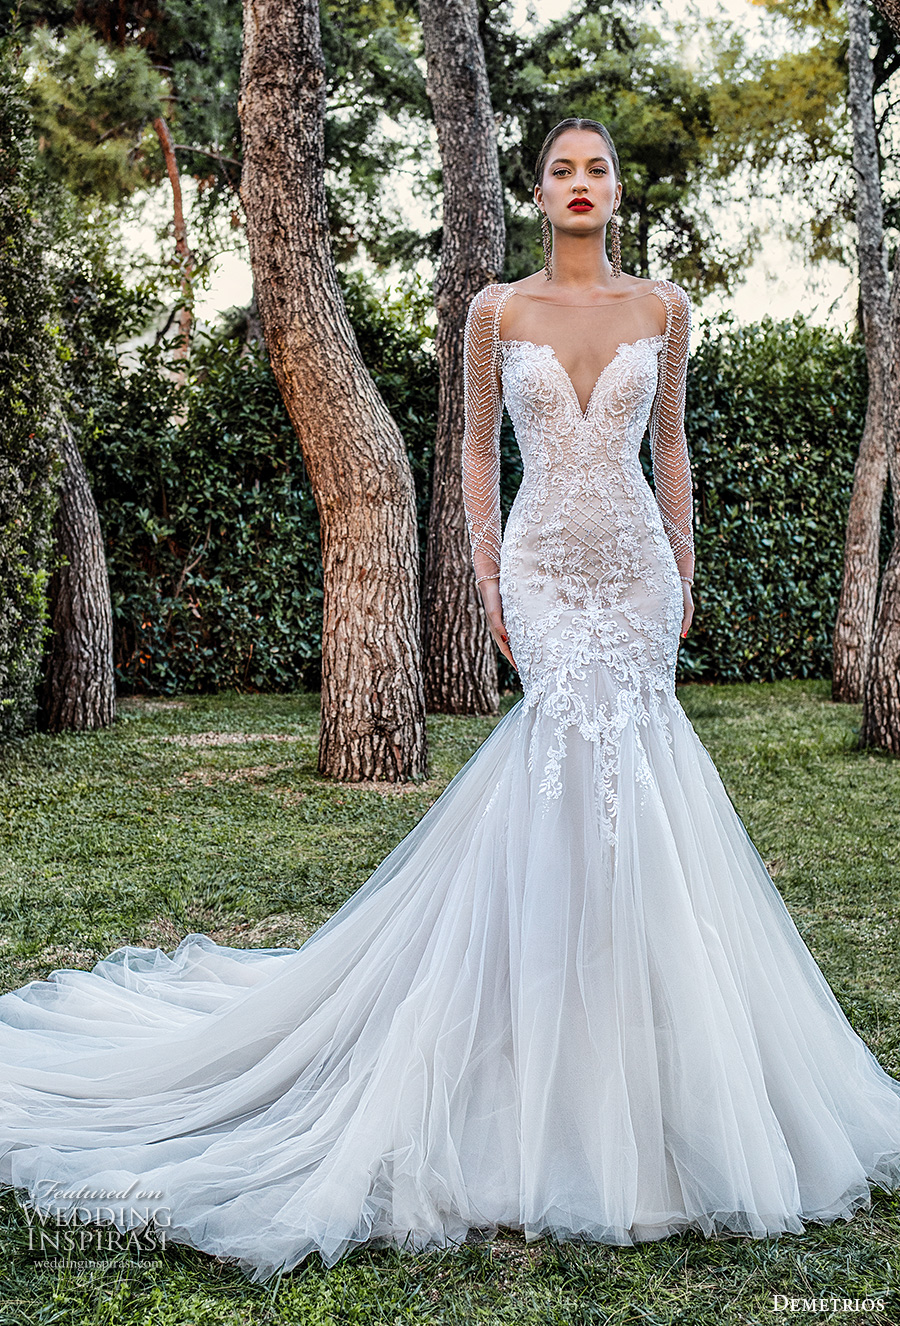 demetrios 2020 bridal long sleeves illusion bateau sweetheart neckline heavily embellished bodice elegant mermaid wedding dress sheer lace back chapel train (8) mv